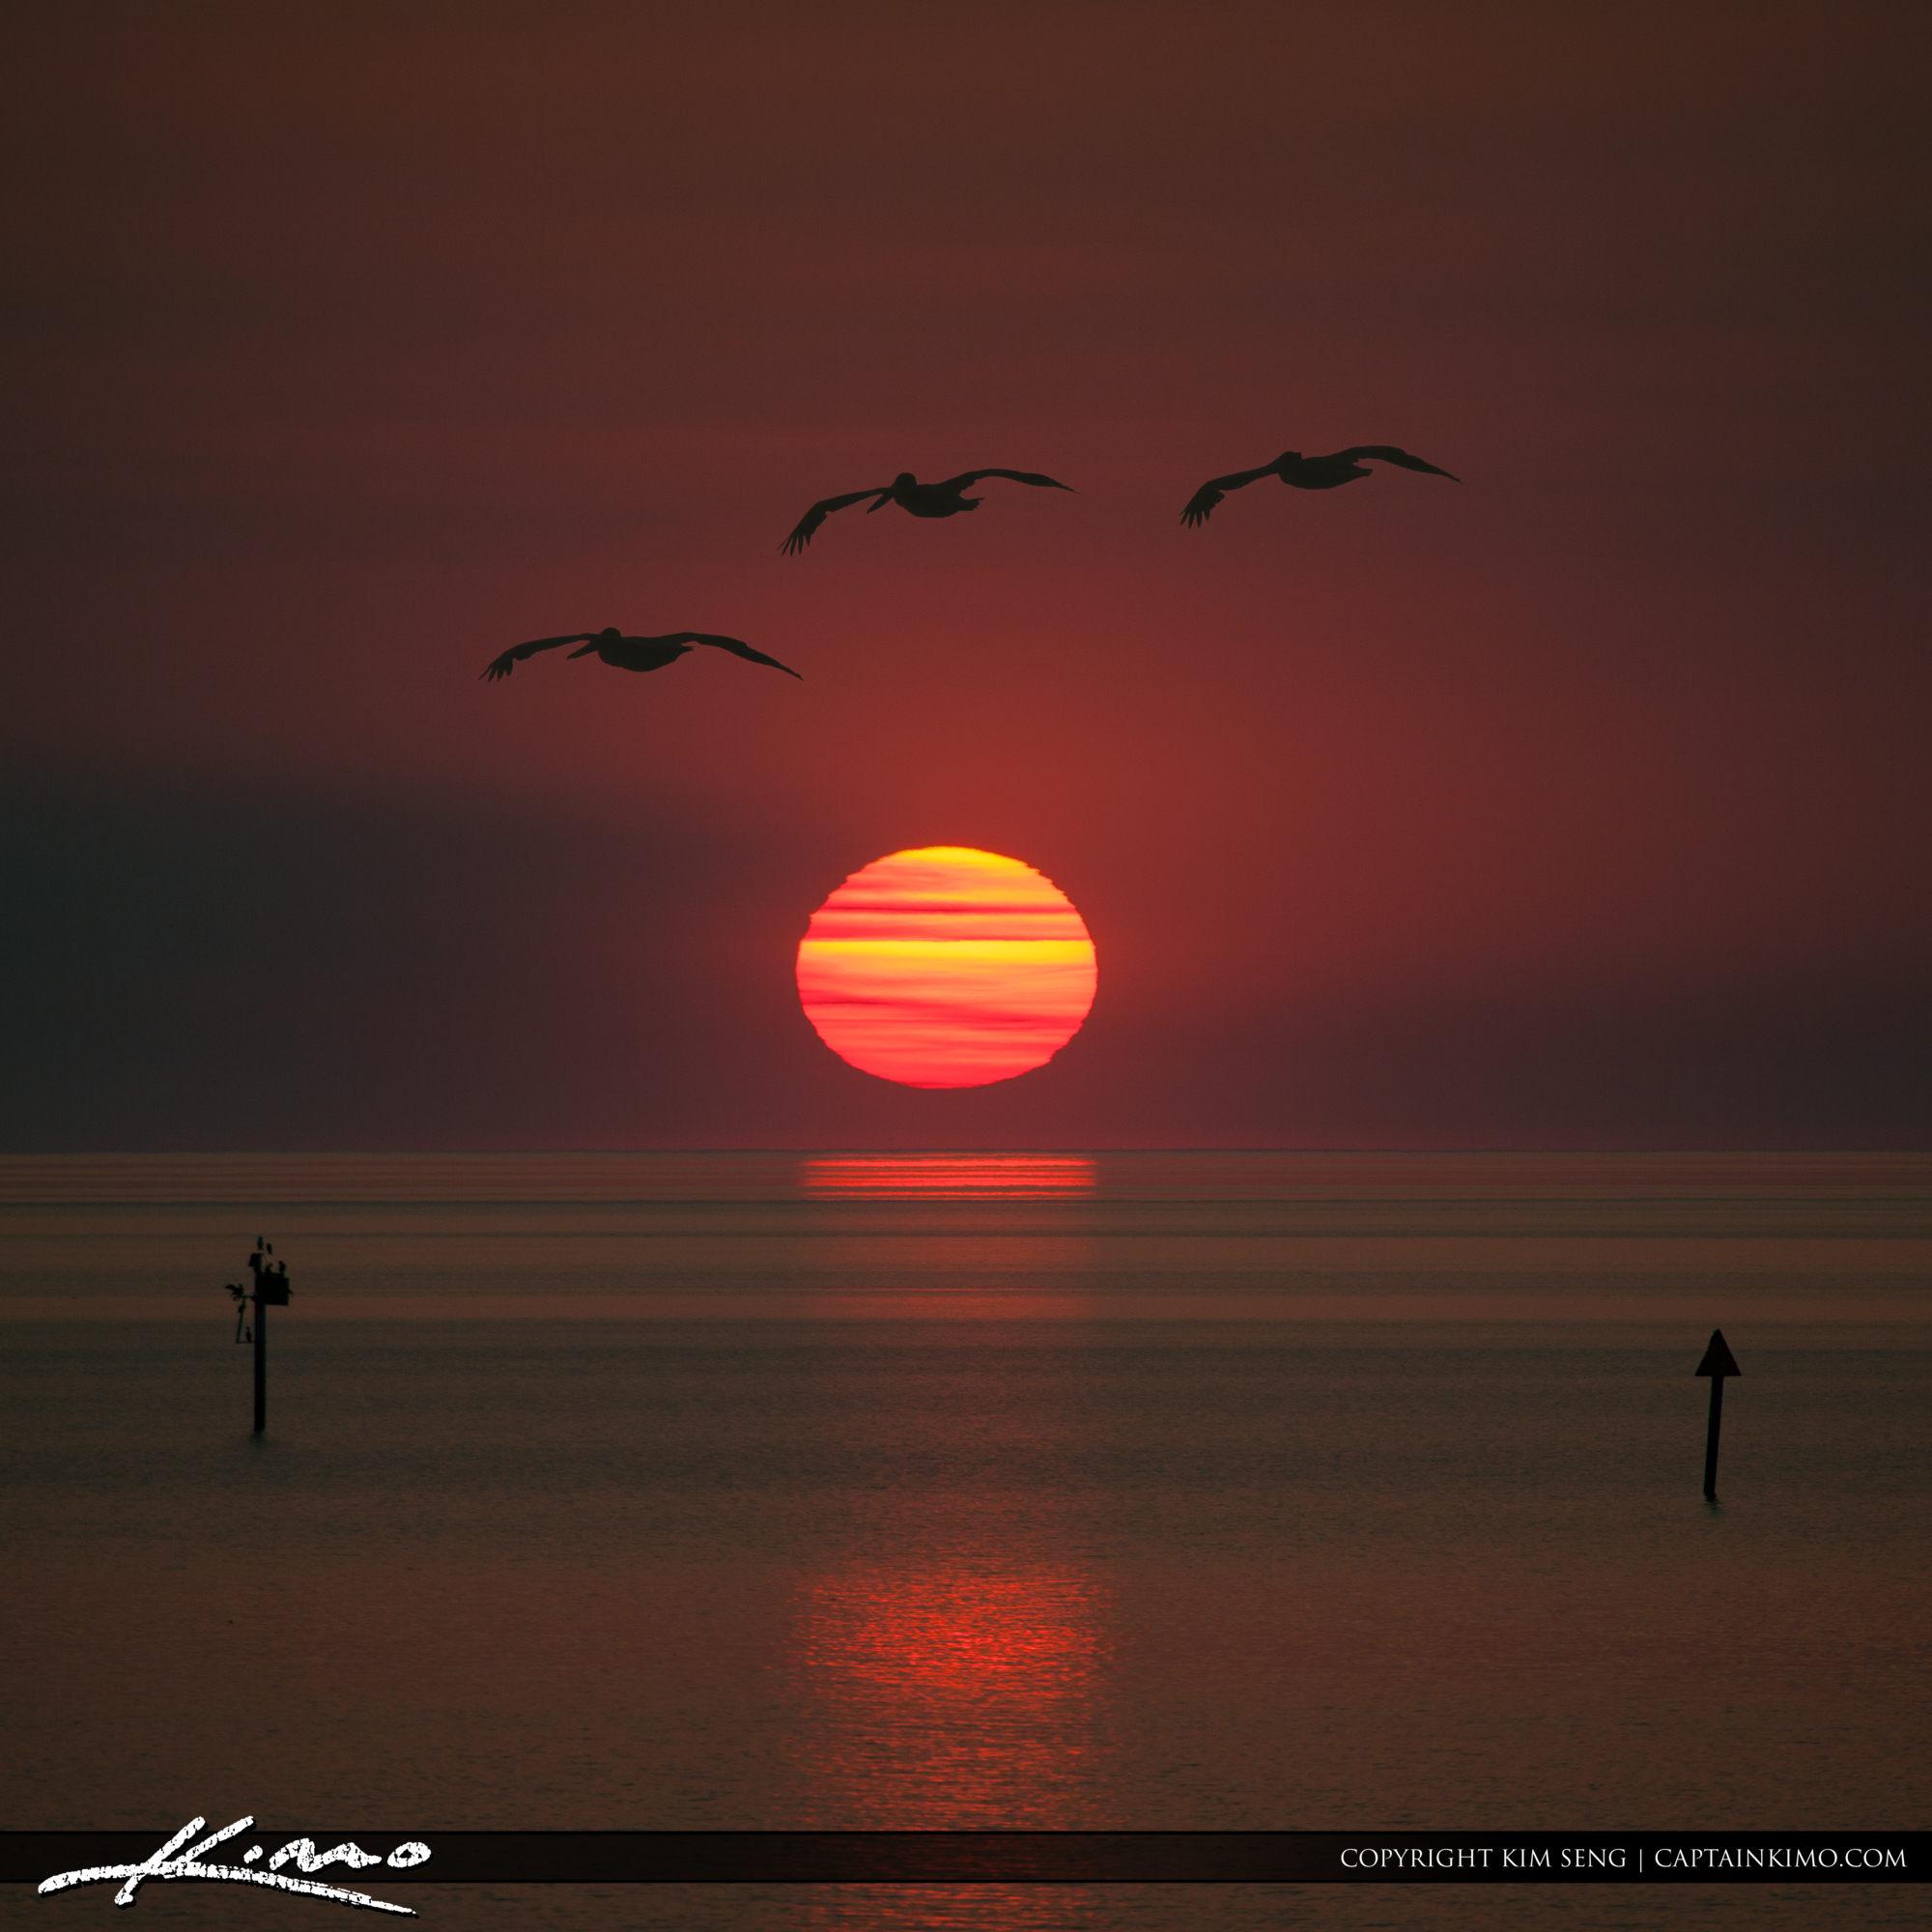 Lake Okeechobee Sunset Pelicans Flying Square